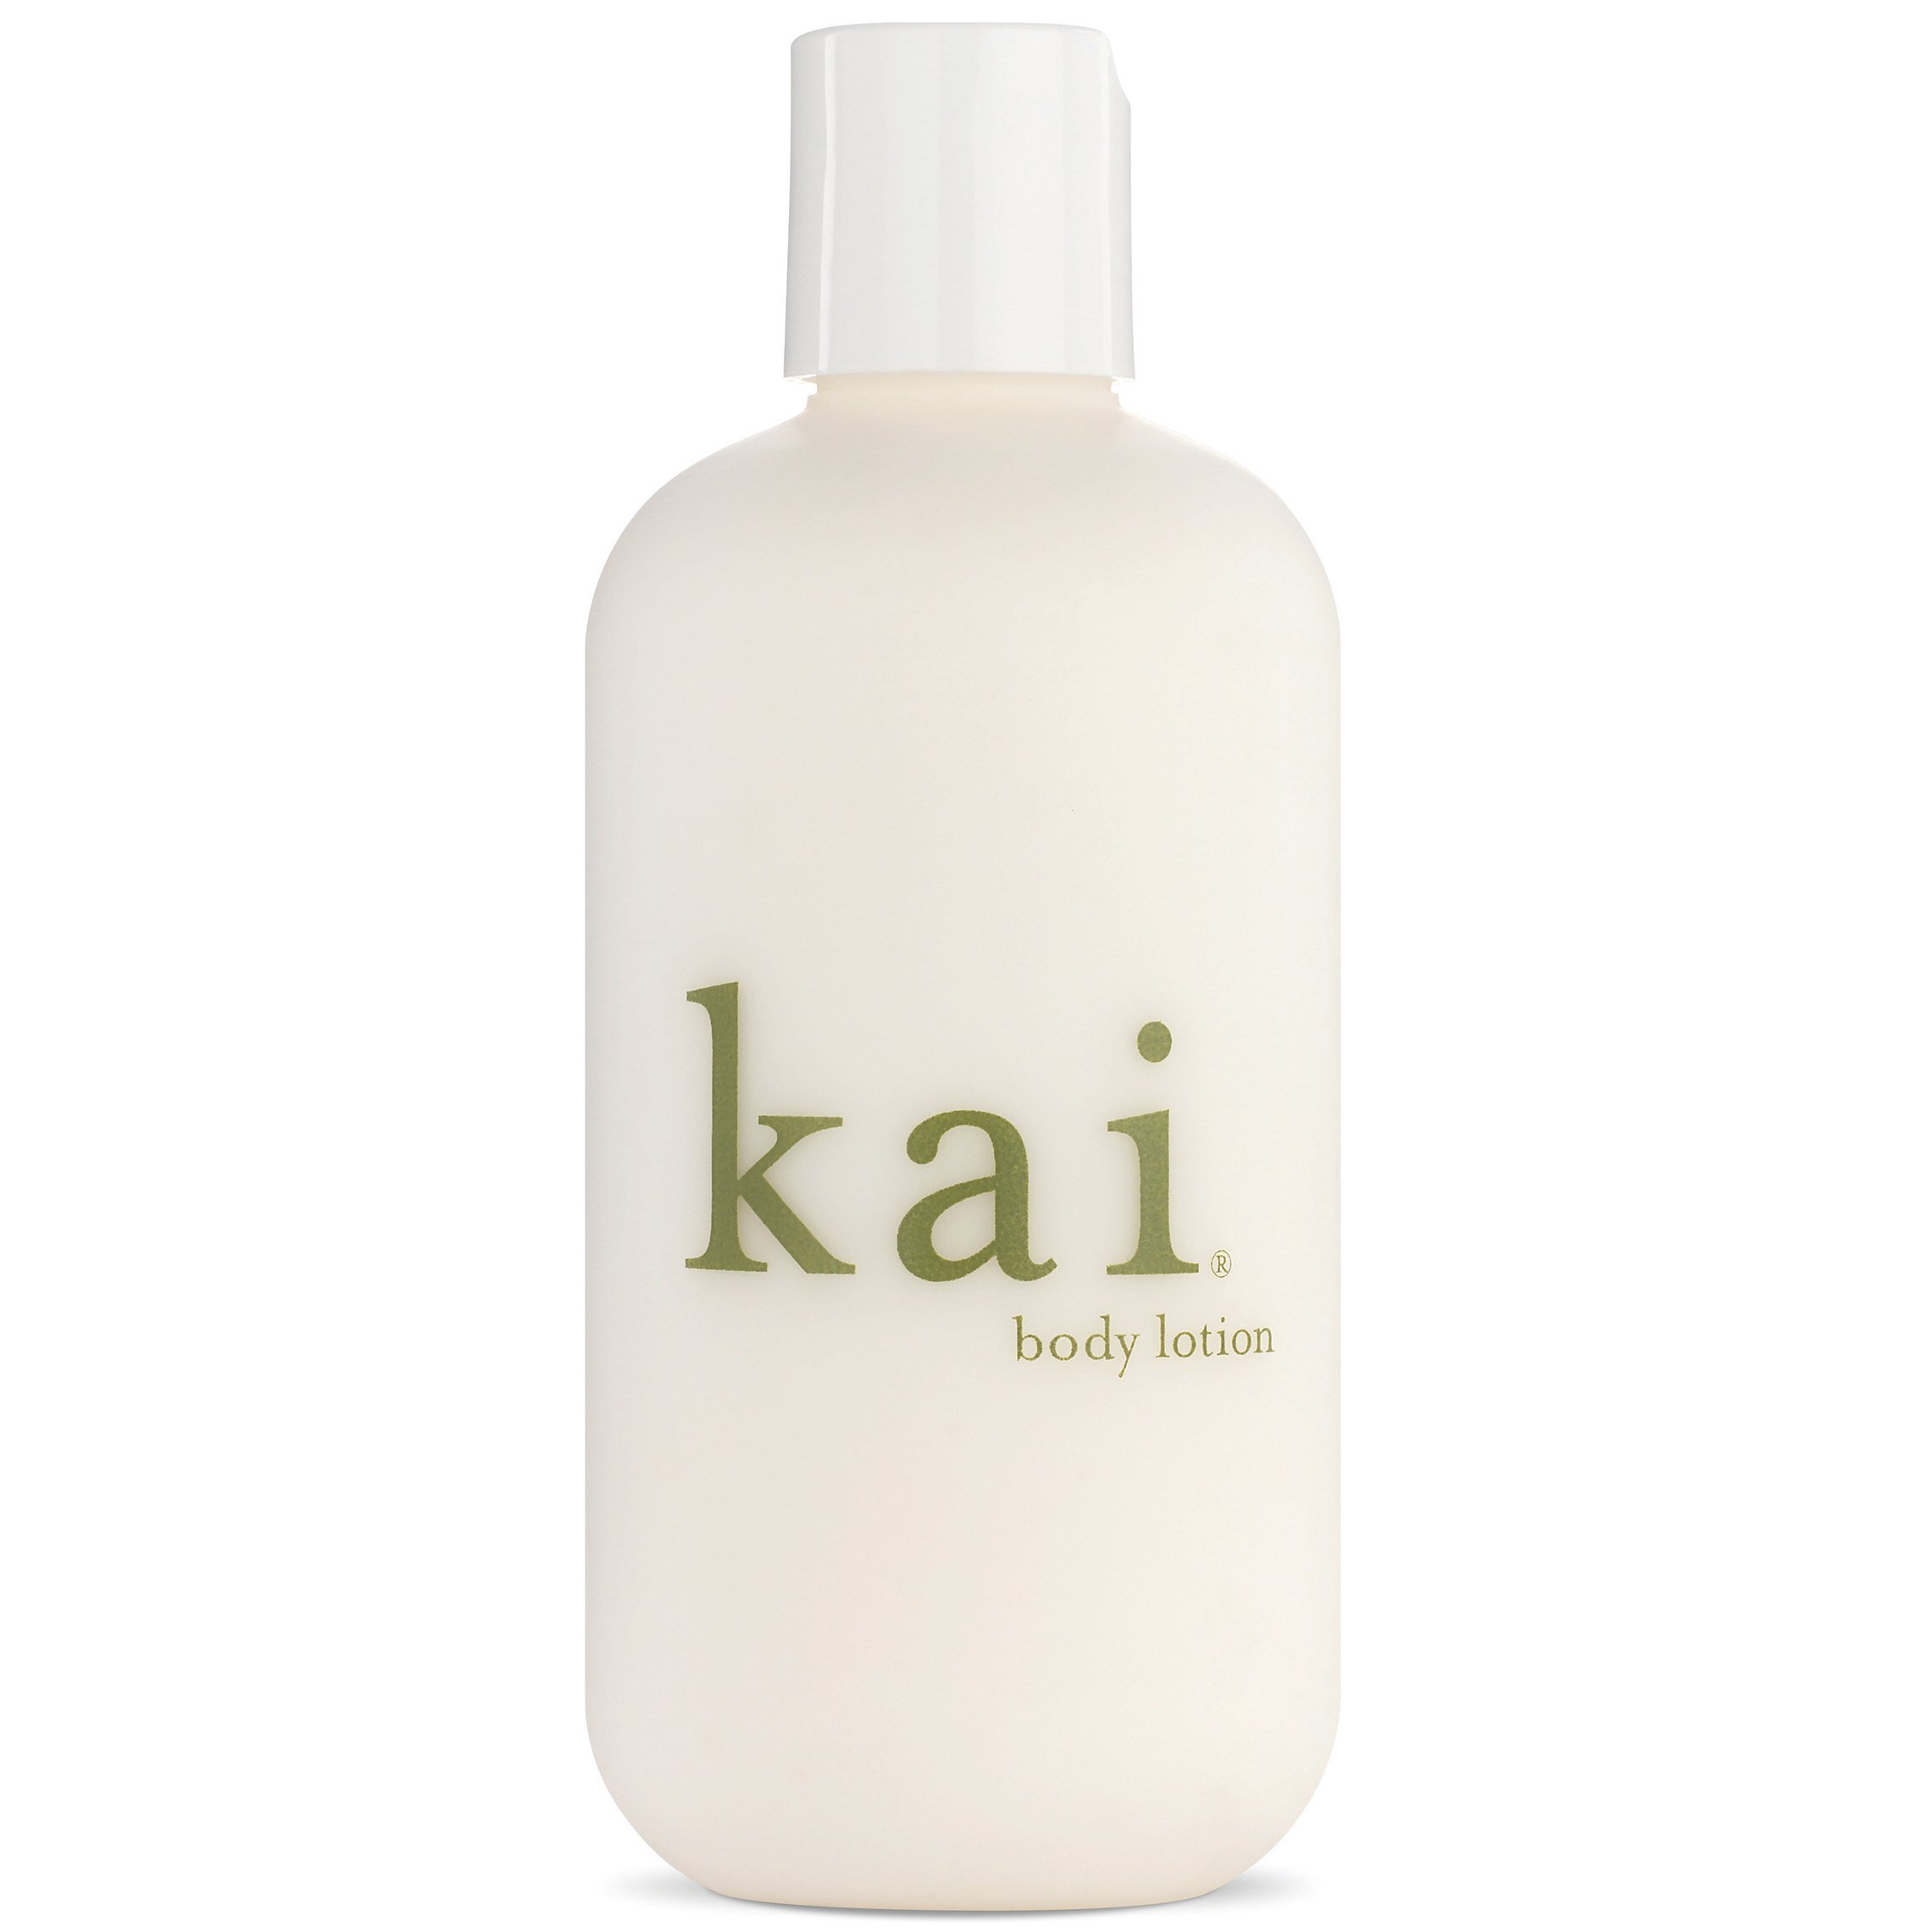 Kai Body Lotion, 8 Ounce